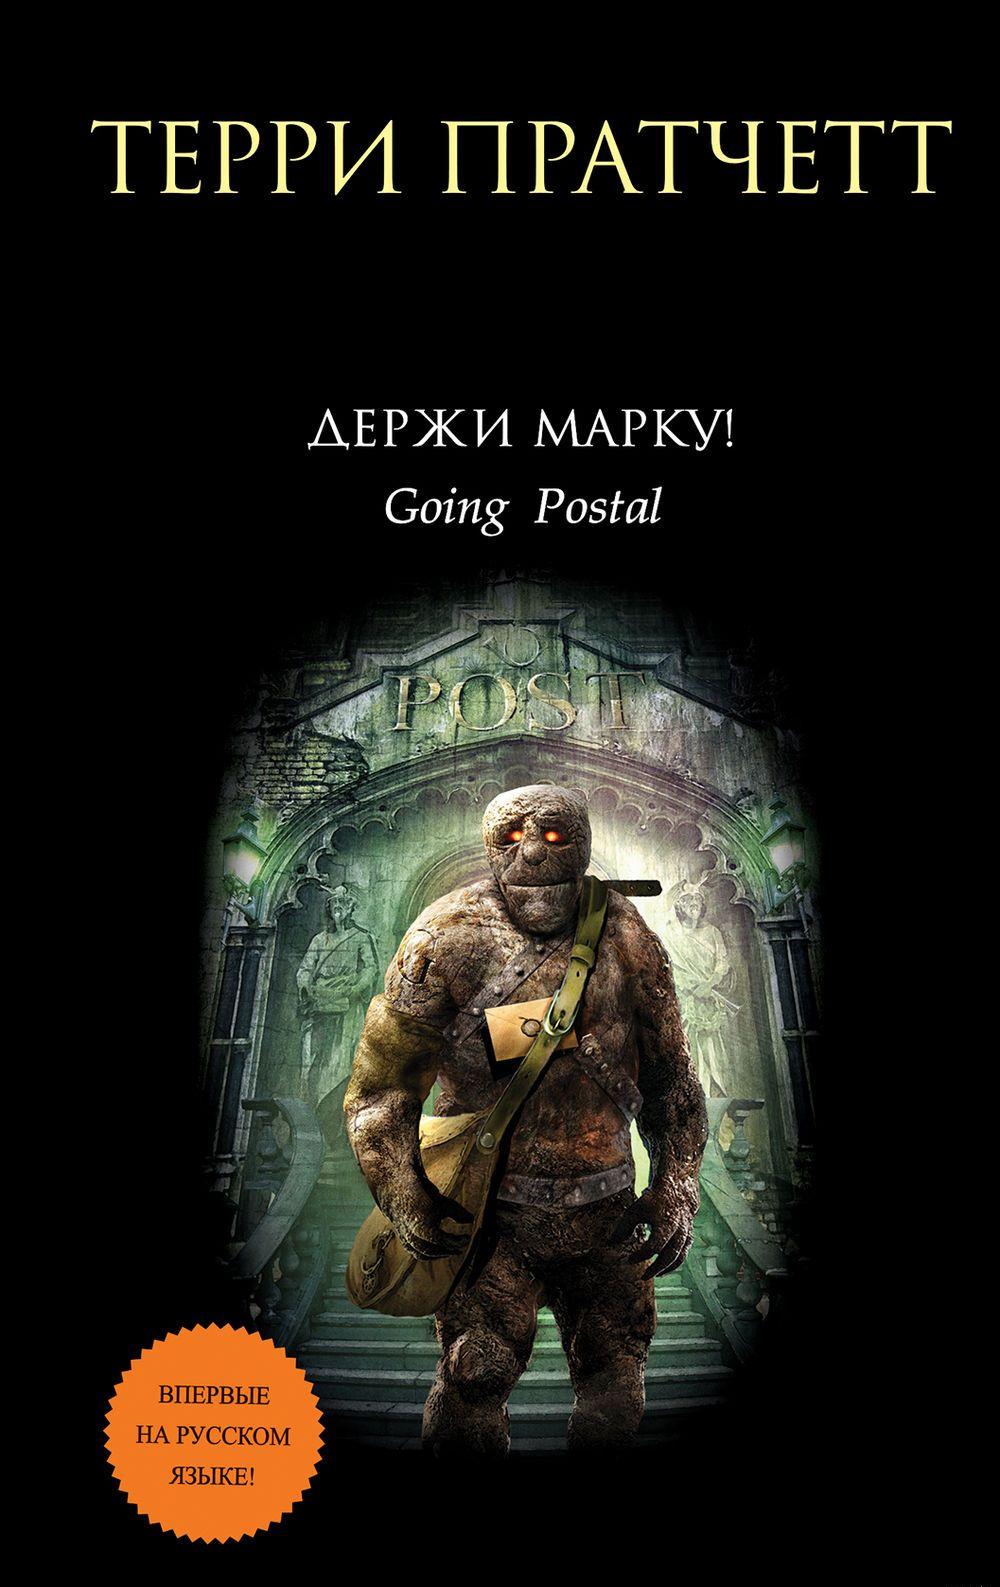 Terri Pratchett Opochtarenie fanatskij perevod